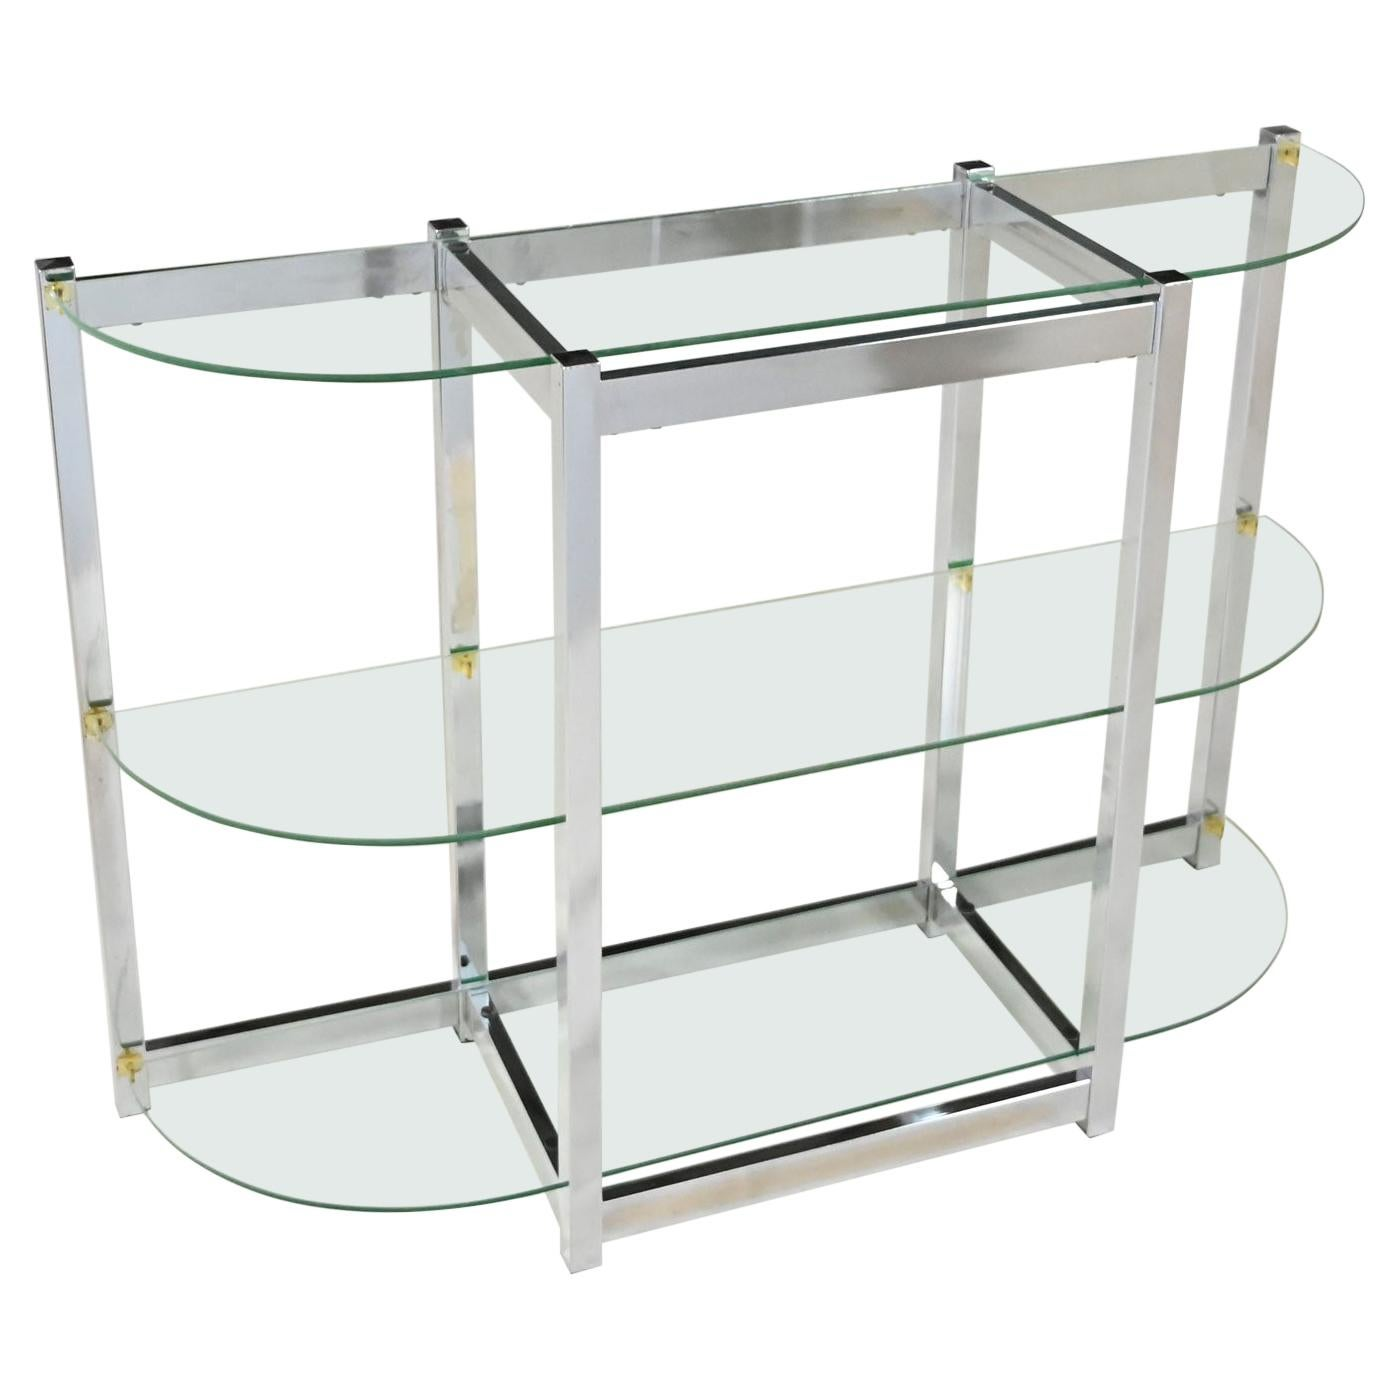 Mid-Century Modern Bow Shape Chrome Sofa Console Table 3 Glass Shelves Style DIA